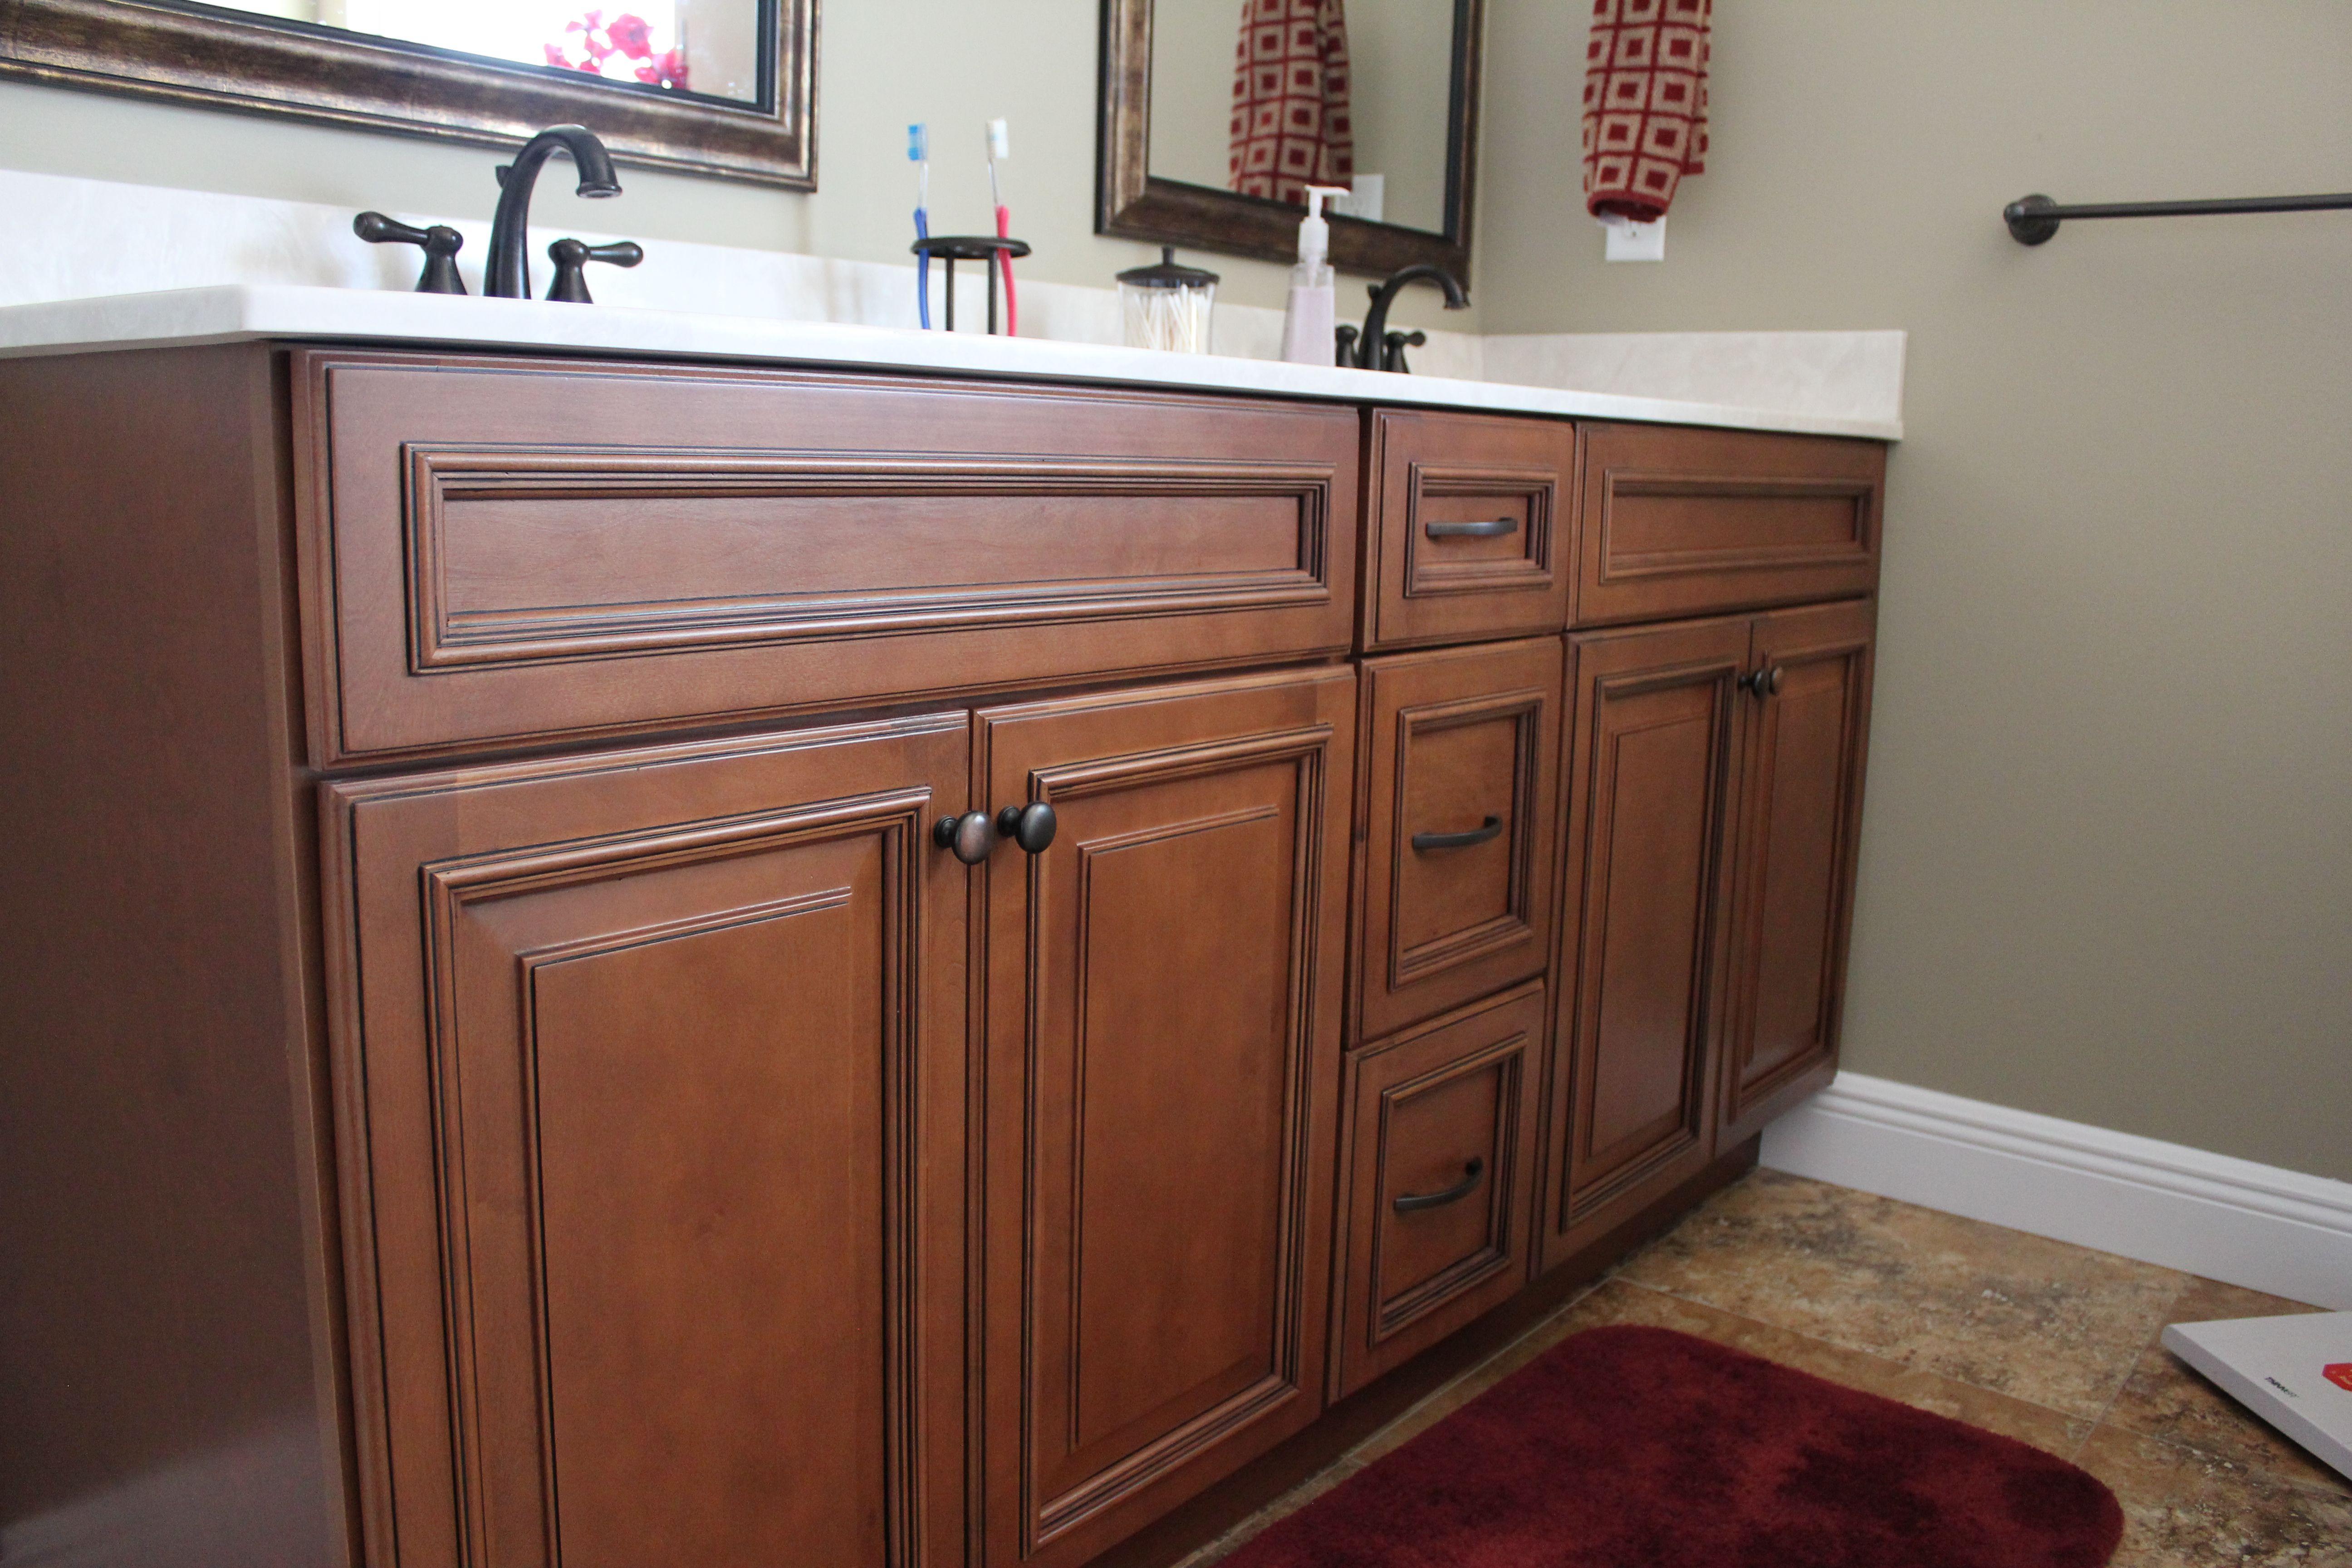 Fabuwood Cabinets, Bathroom Cabinetry, Cinnamon Glaze, Three Stack Vanity  Drawer, 3 Stack